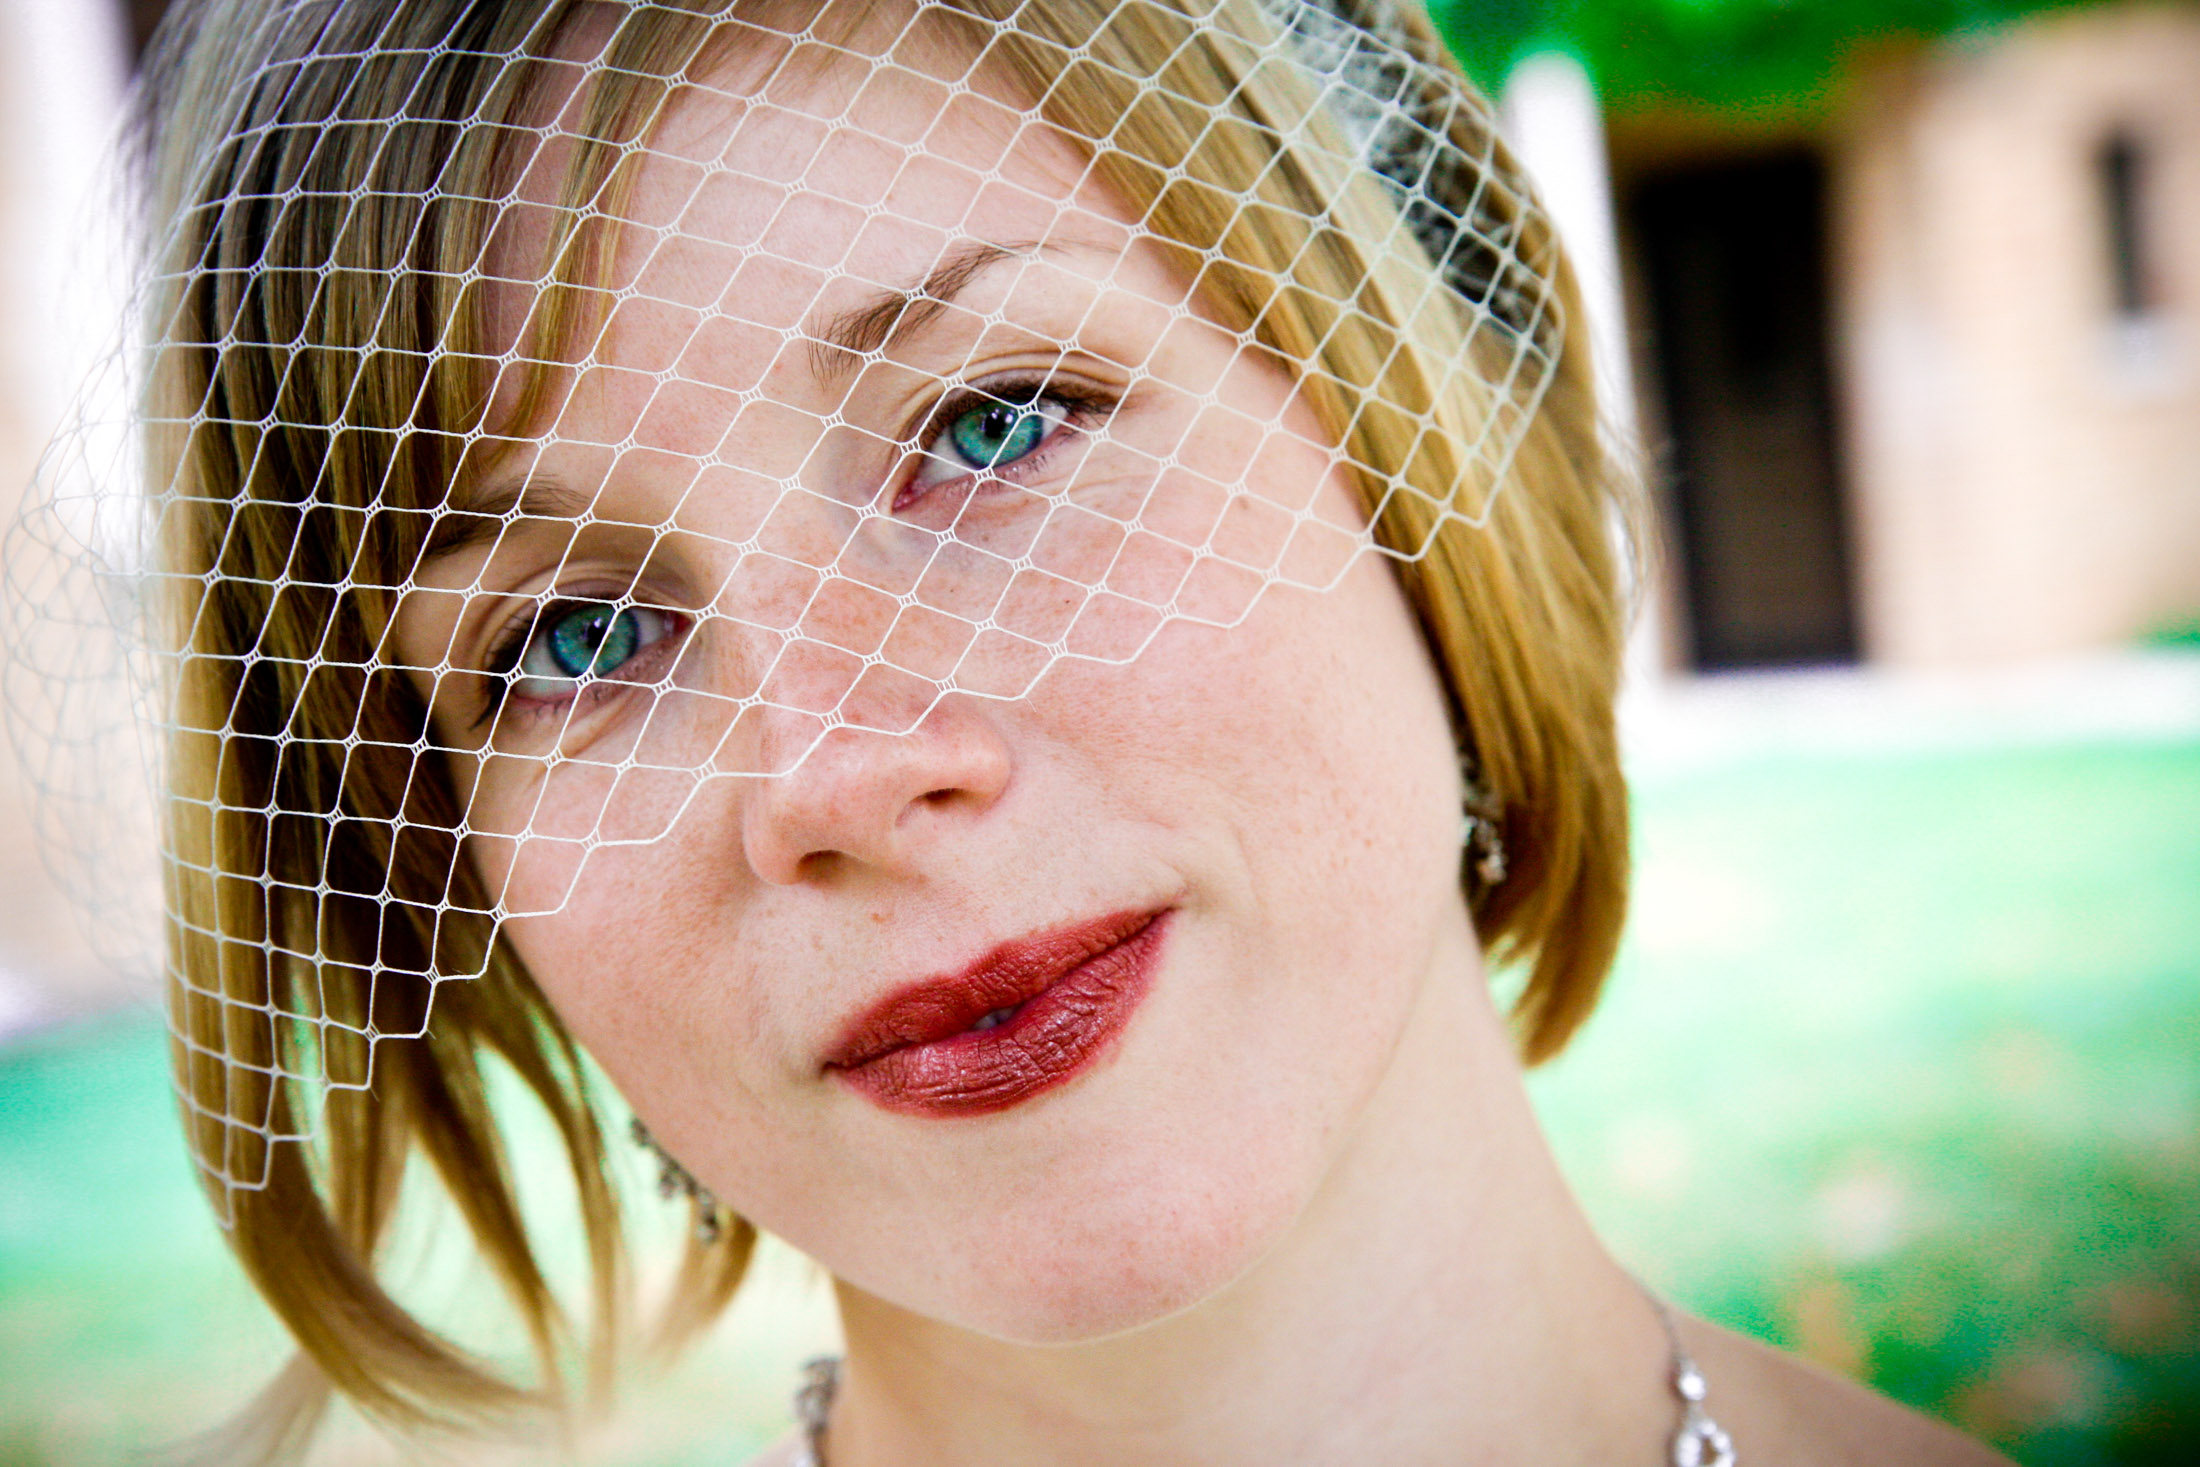 bride-red-lipstick-wedding-photographer-adam-shea-photography-green+bay-appleton-neenah-oshkosh-fond-du-lac-wisconsin-photos.jpeg